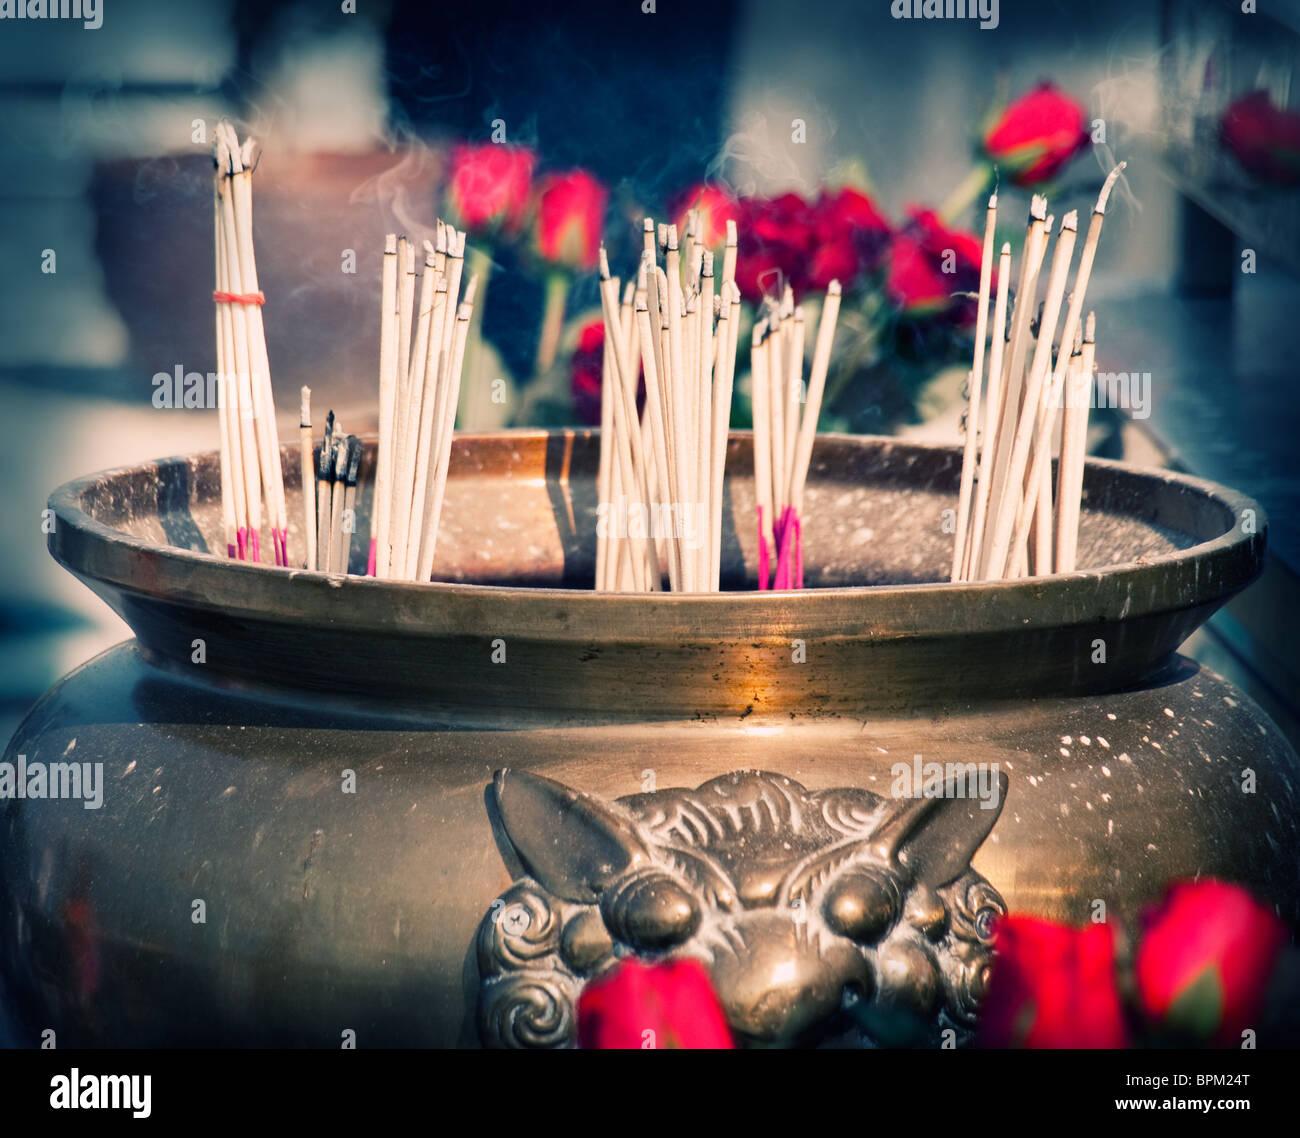 Buddhist shrine with smoking incense sticks and roses, cross-processed image , closeup Stock Photo